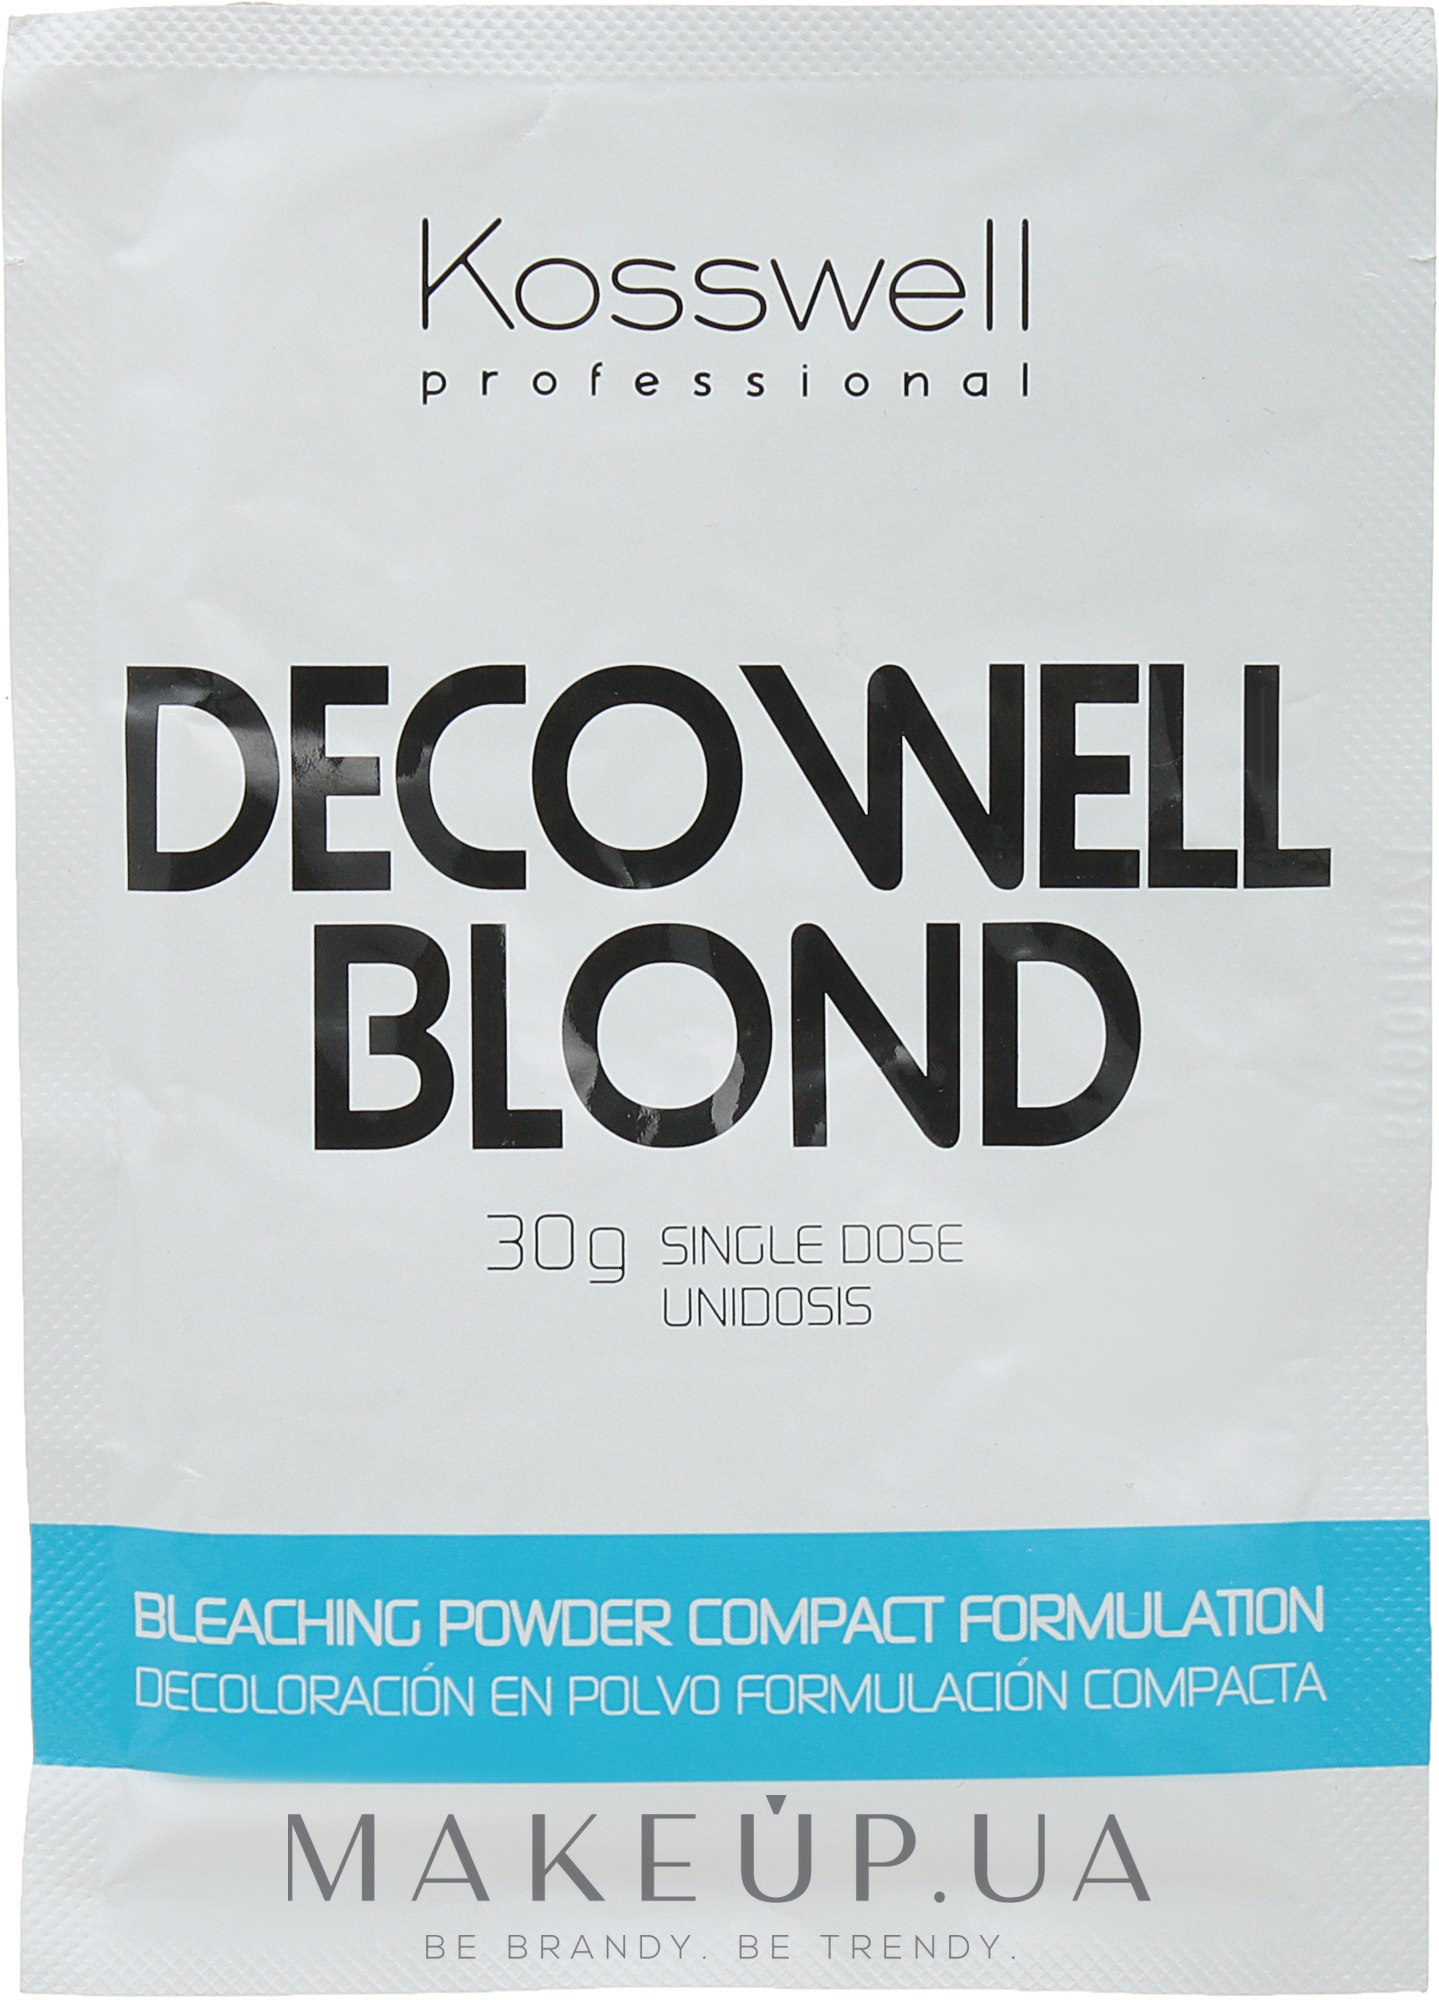 Осветляющий порошок, голубой - Kosswell Professional Decowell Blond — фото 30g